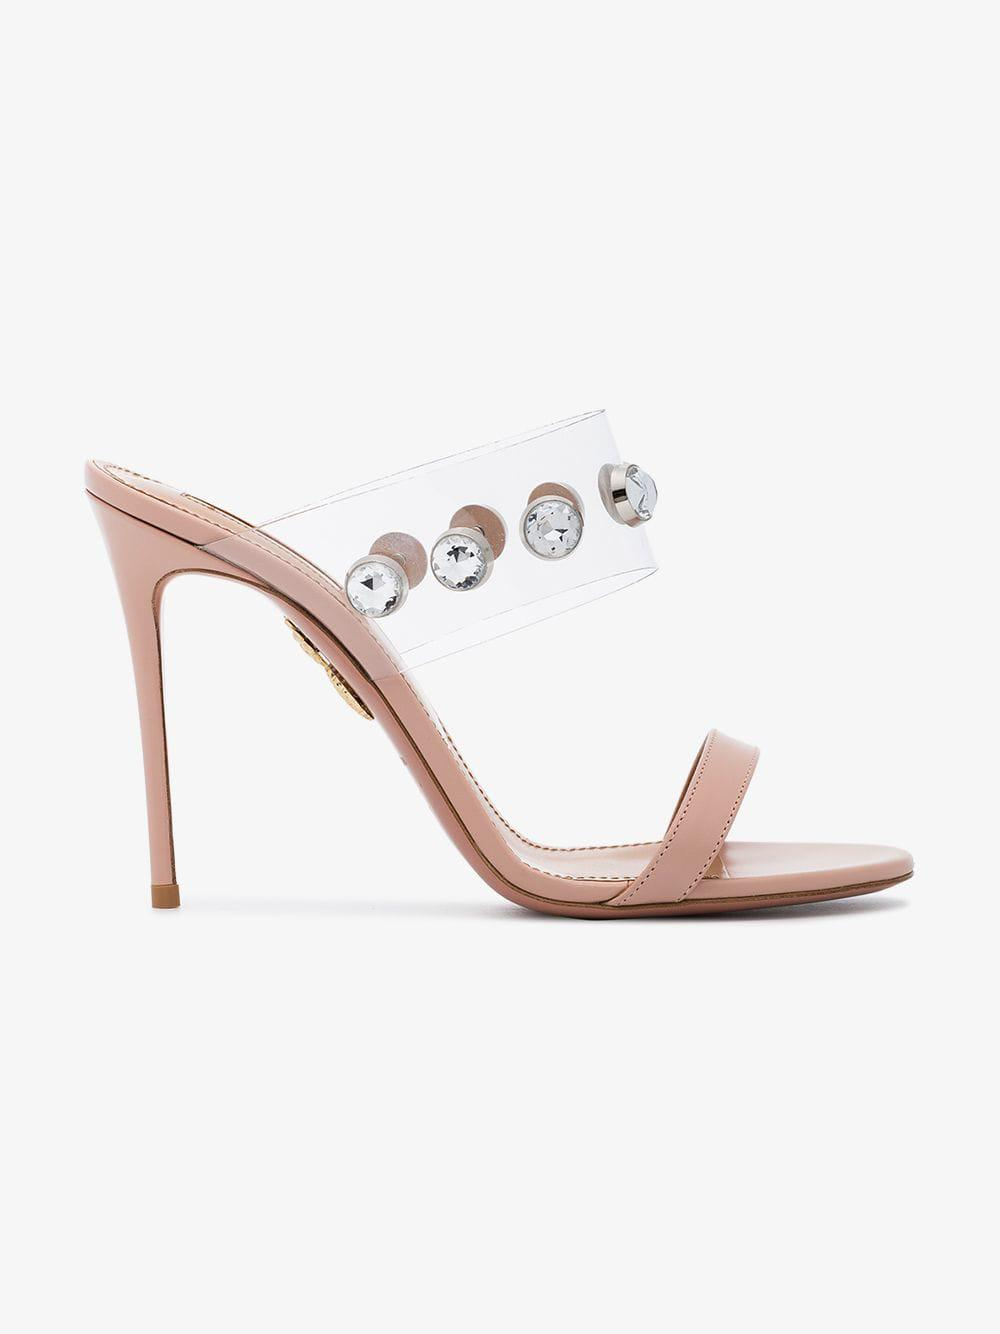 huge discount e49b8 135a8 aquazzura-pinkpurple-Pink-Galaxy-105-Pvc-Crystal-Leather-Mules.jpeg